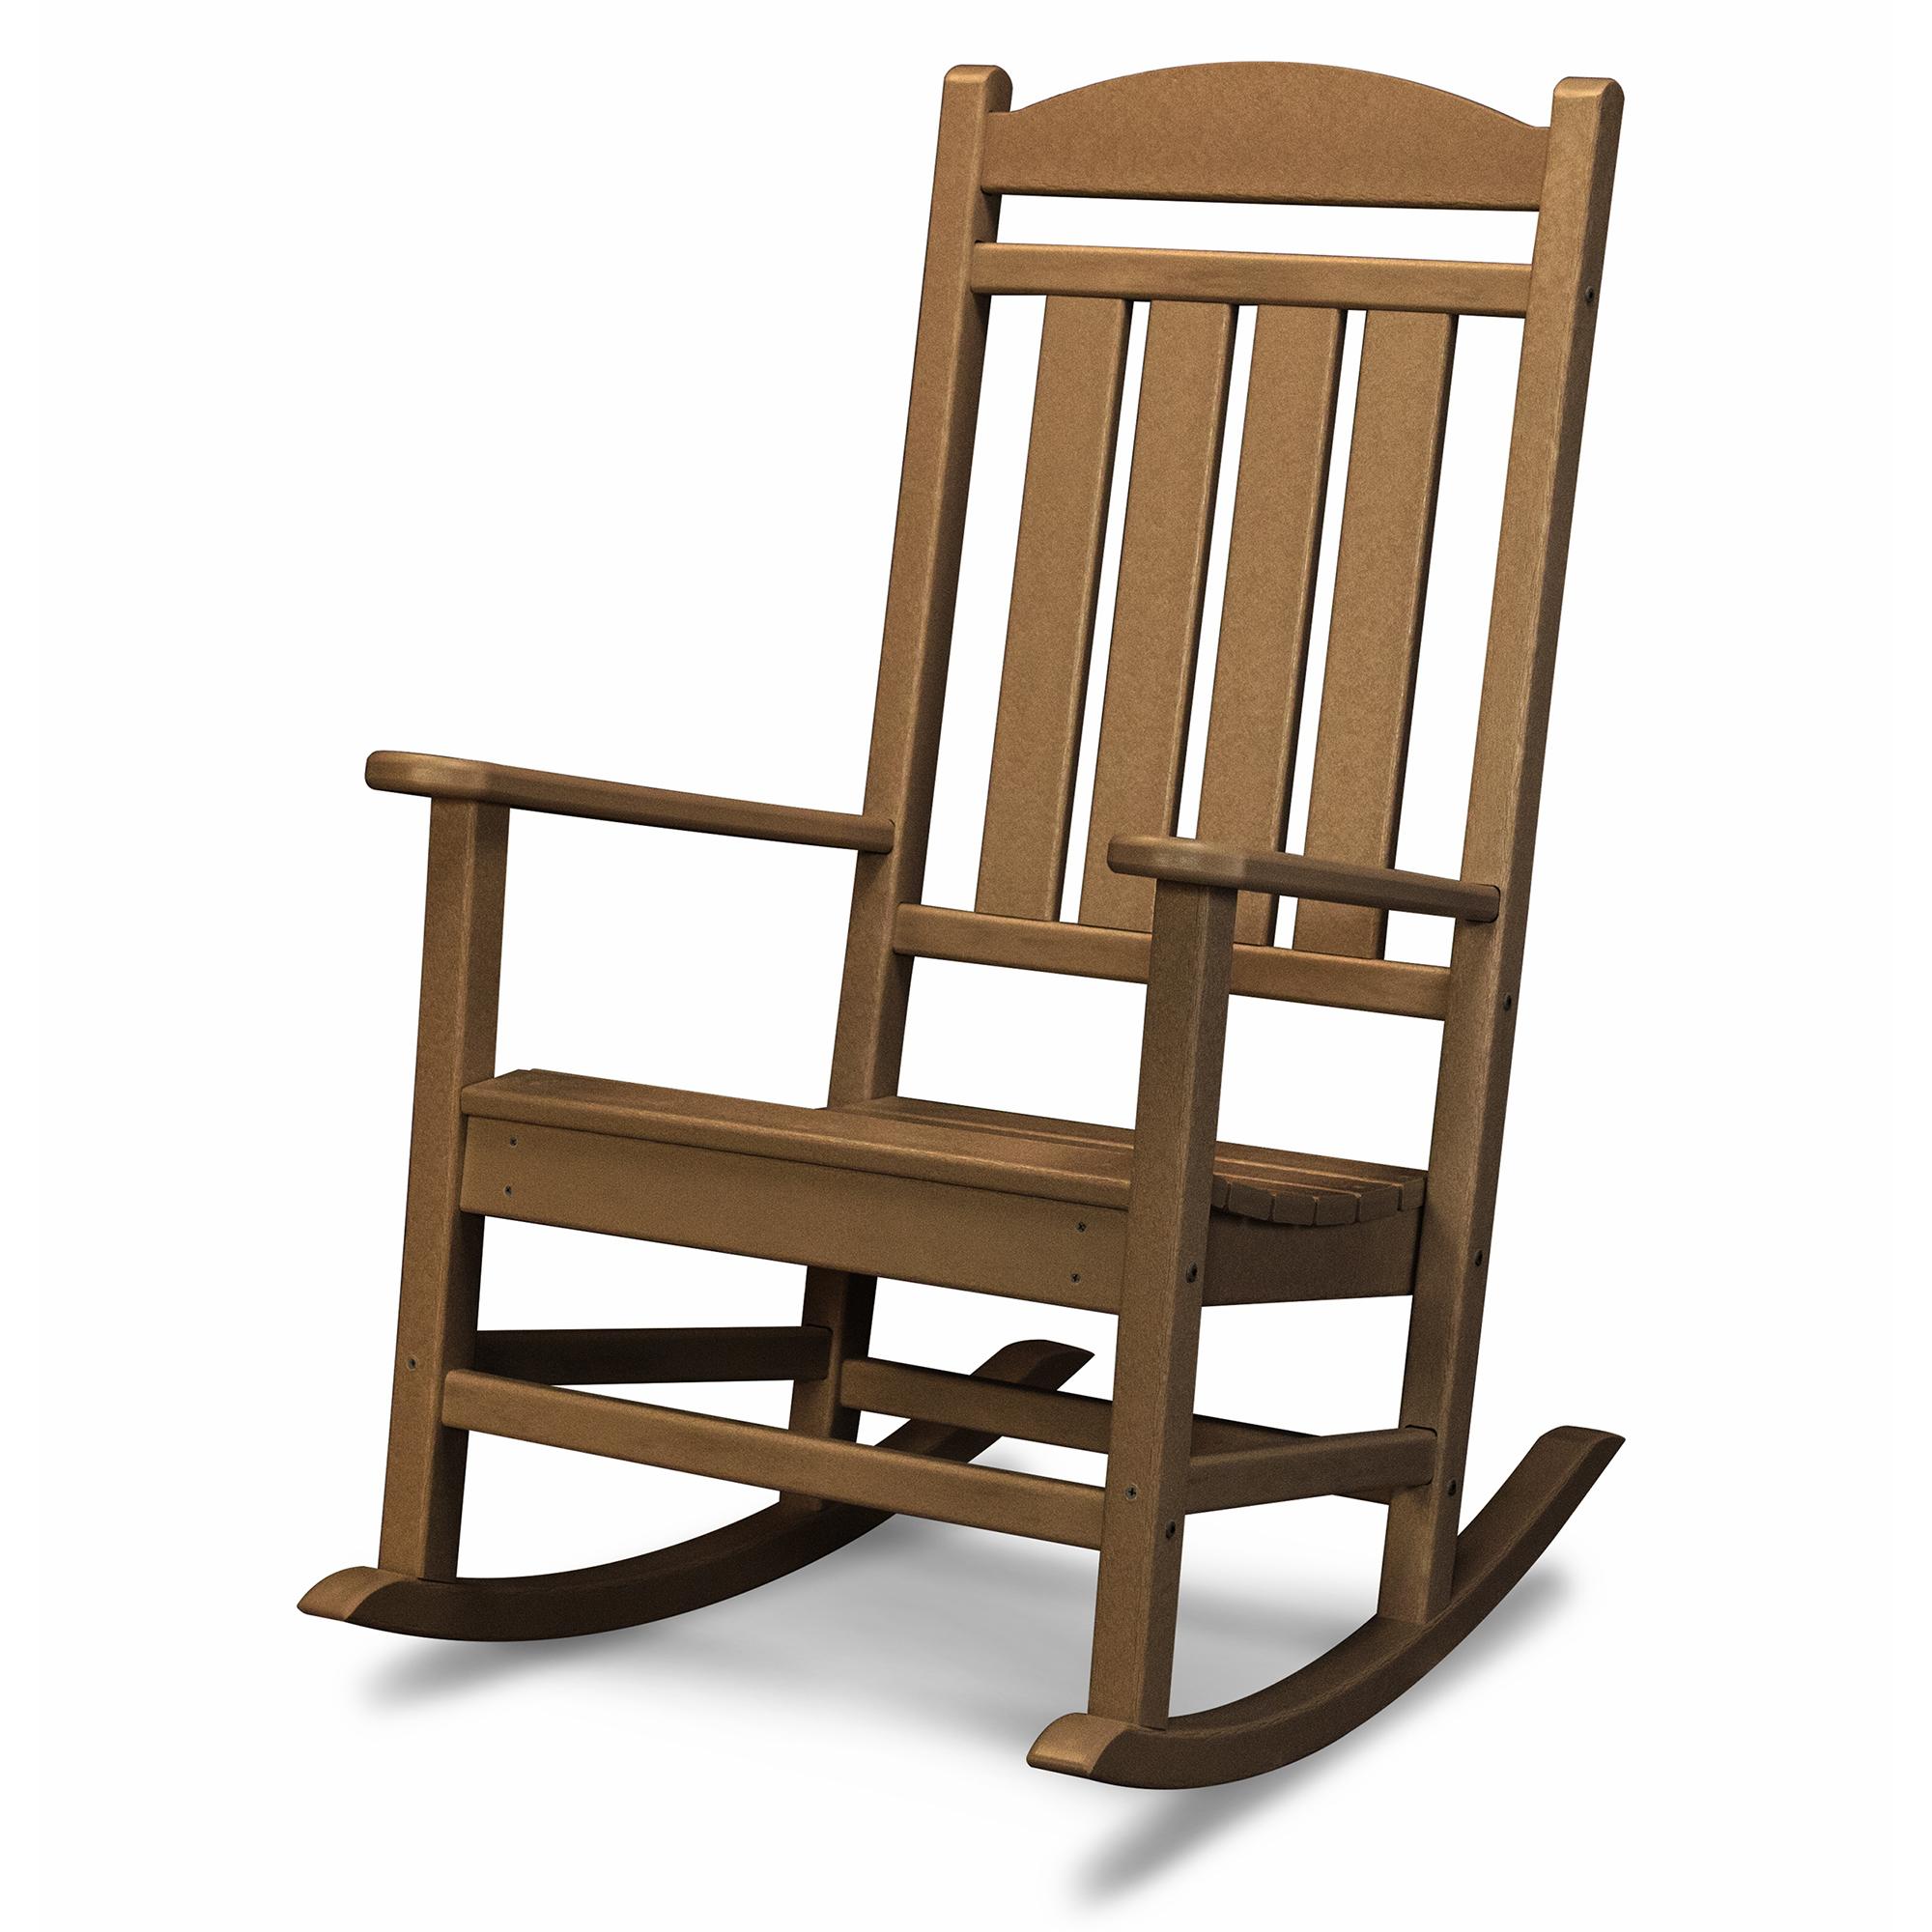 American Made Indoor Furniture